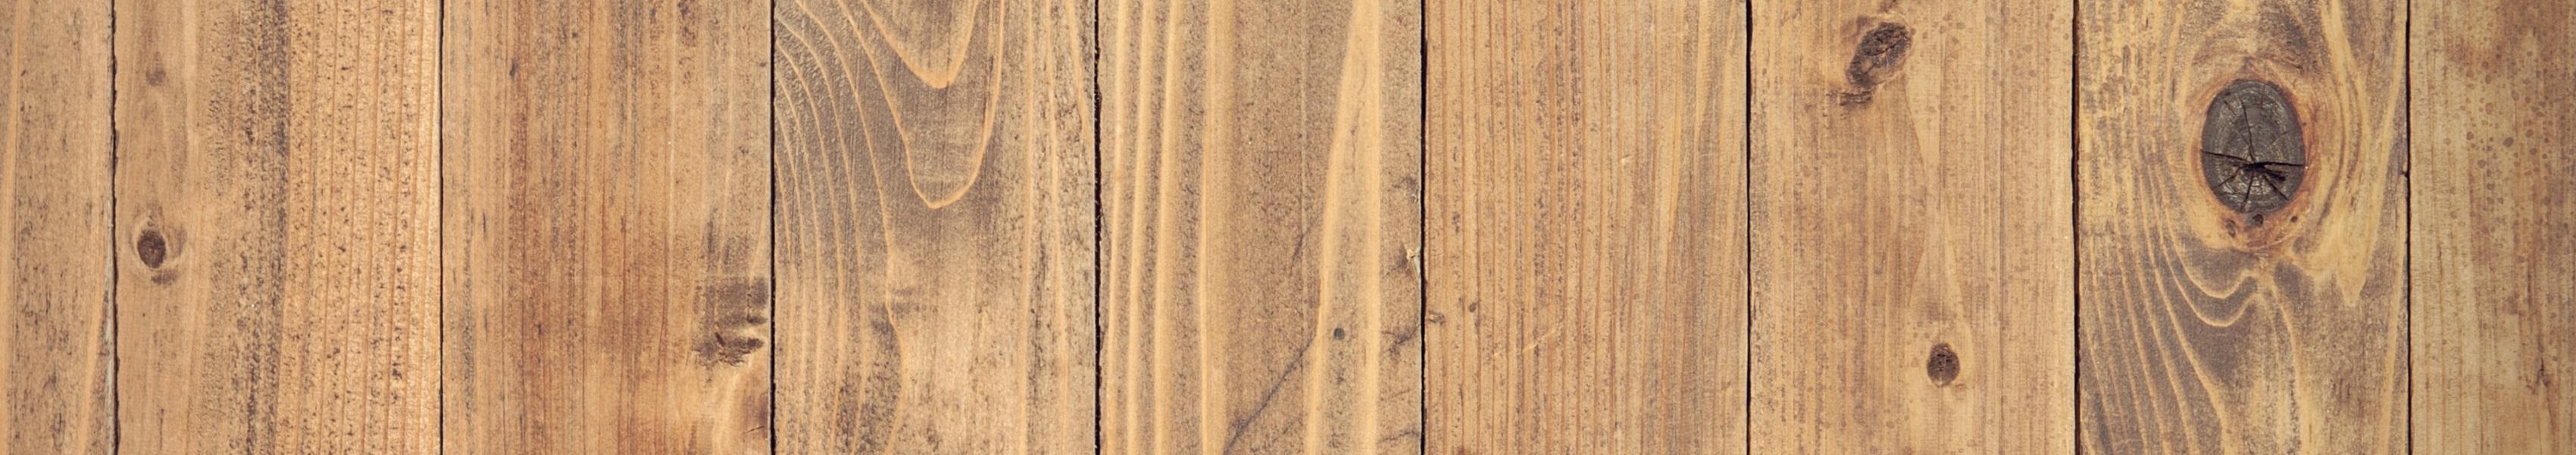 225mm X 44mm (9 X 2) Timber